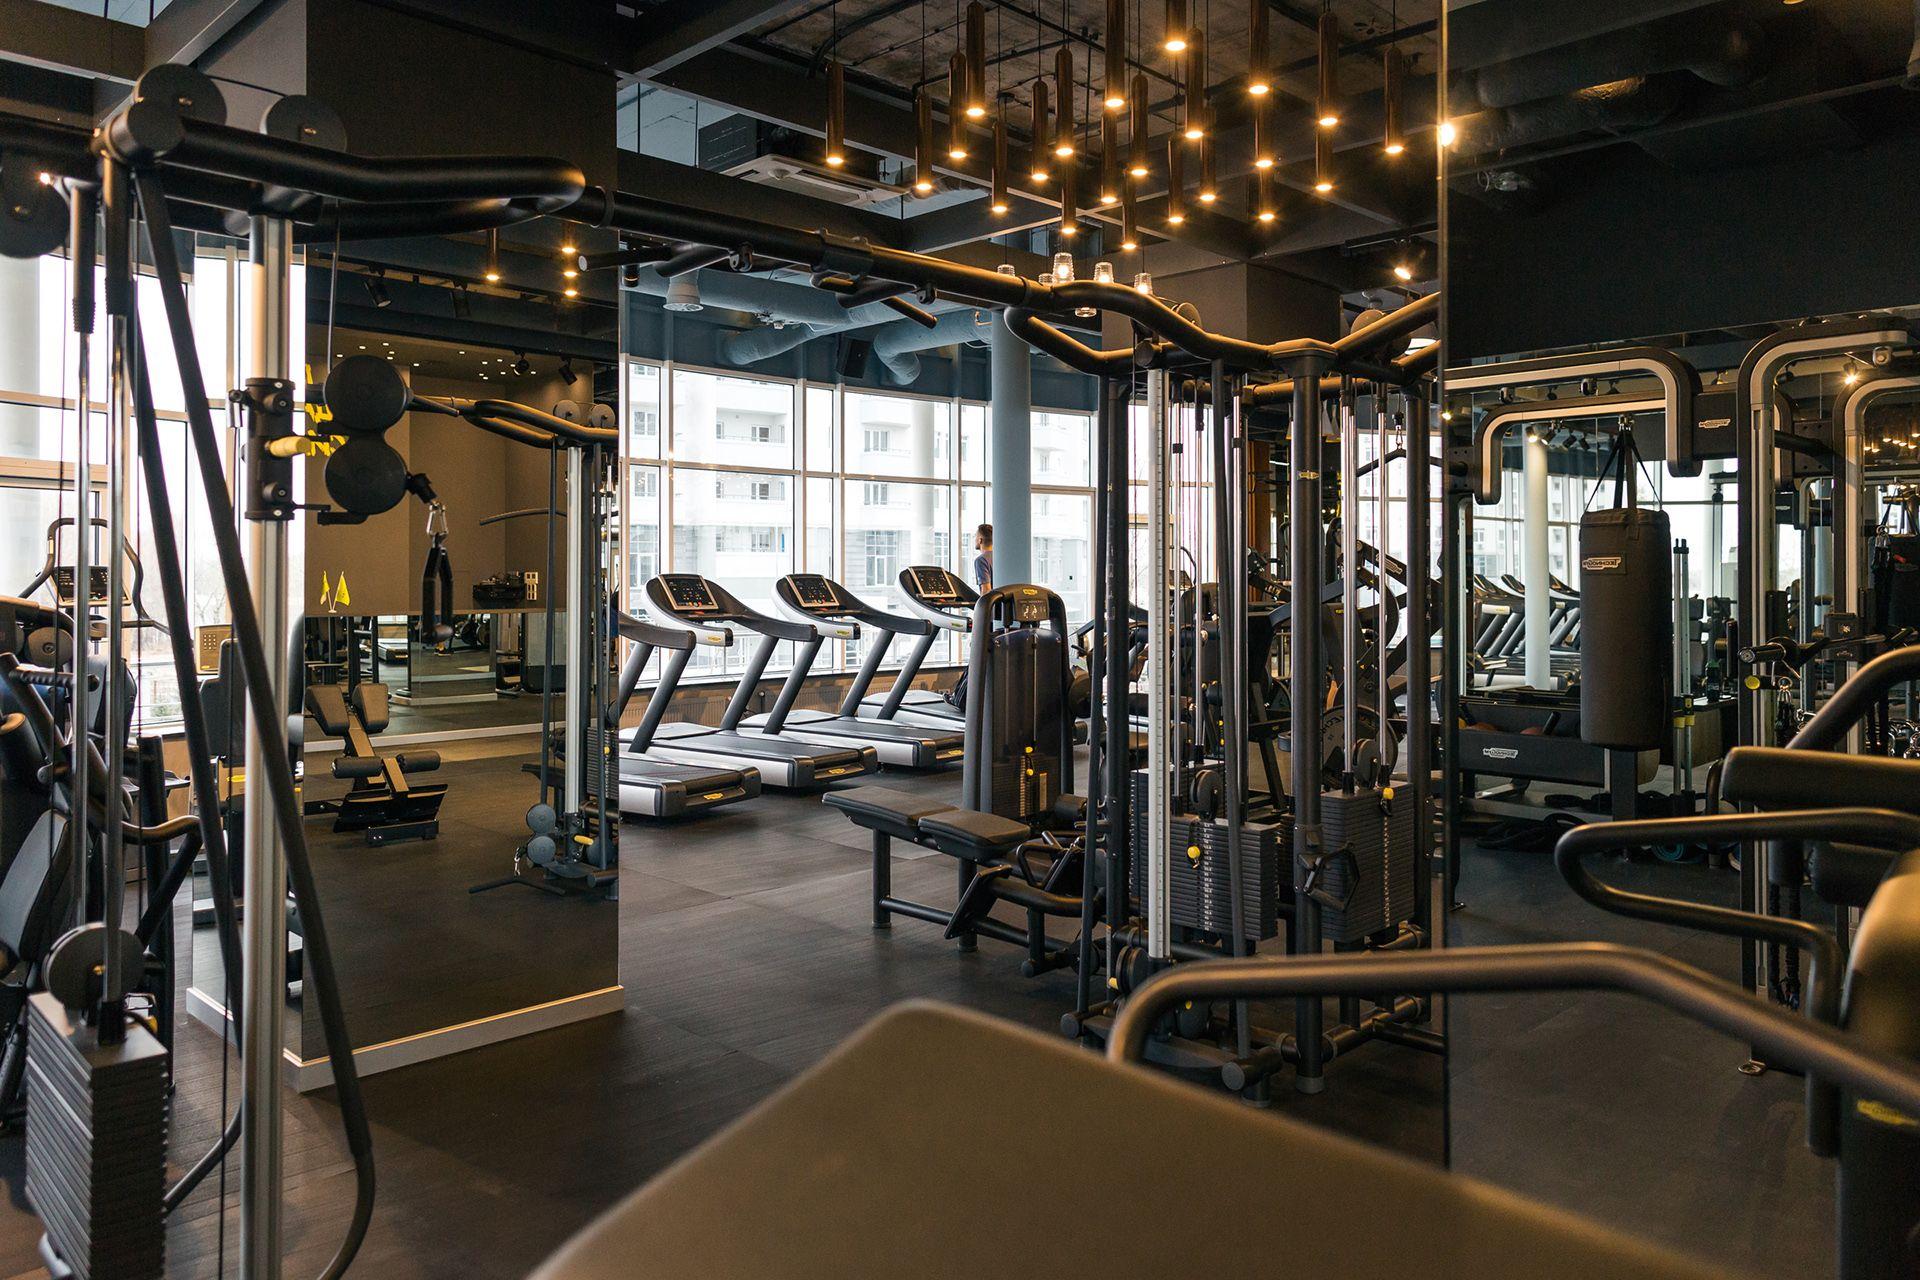 Fitness club palestra on behance 헬욤장 디자인 헬욤장 인템리어 인템리어